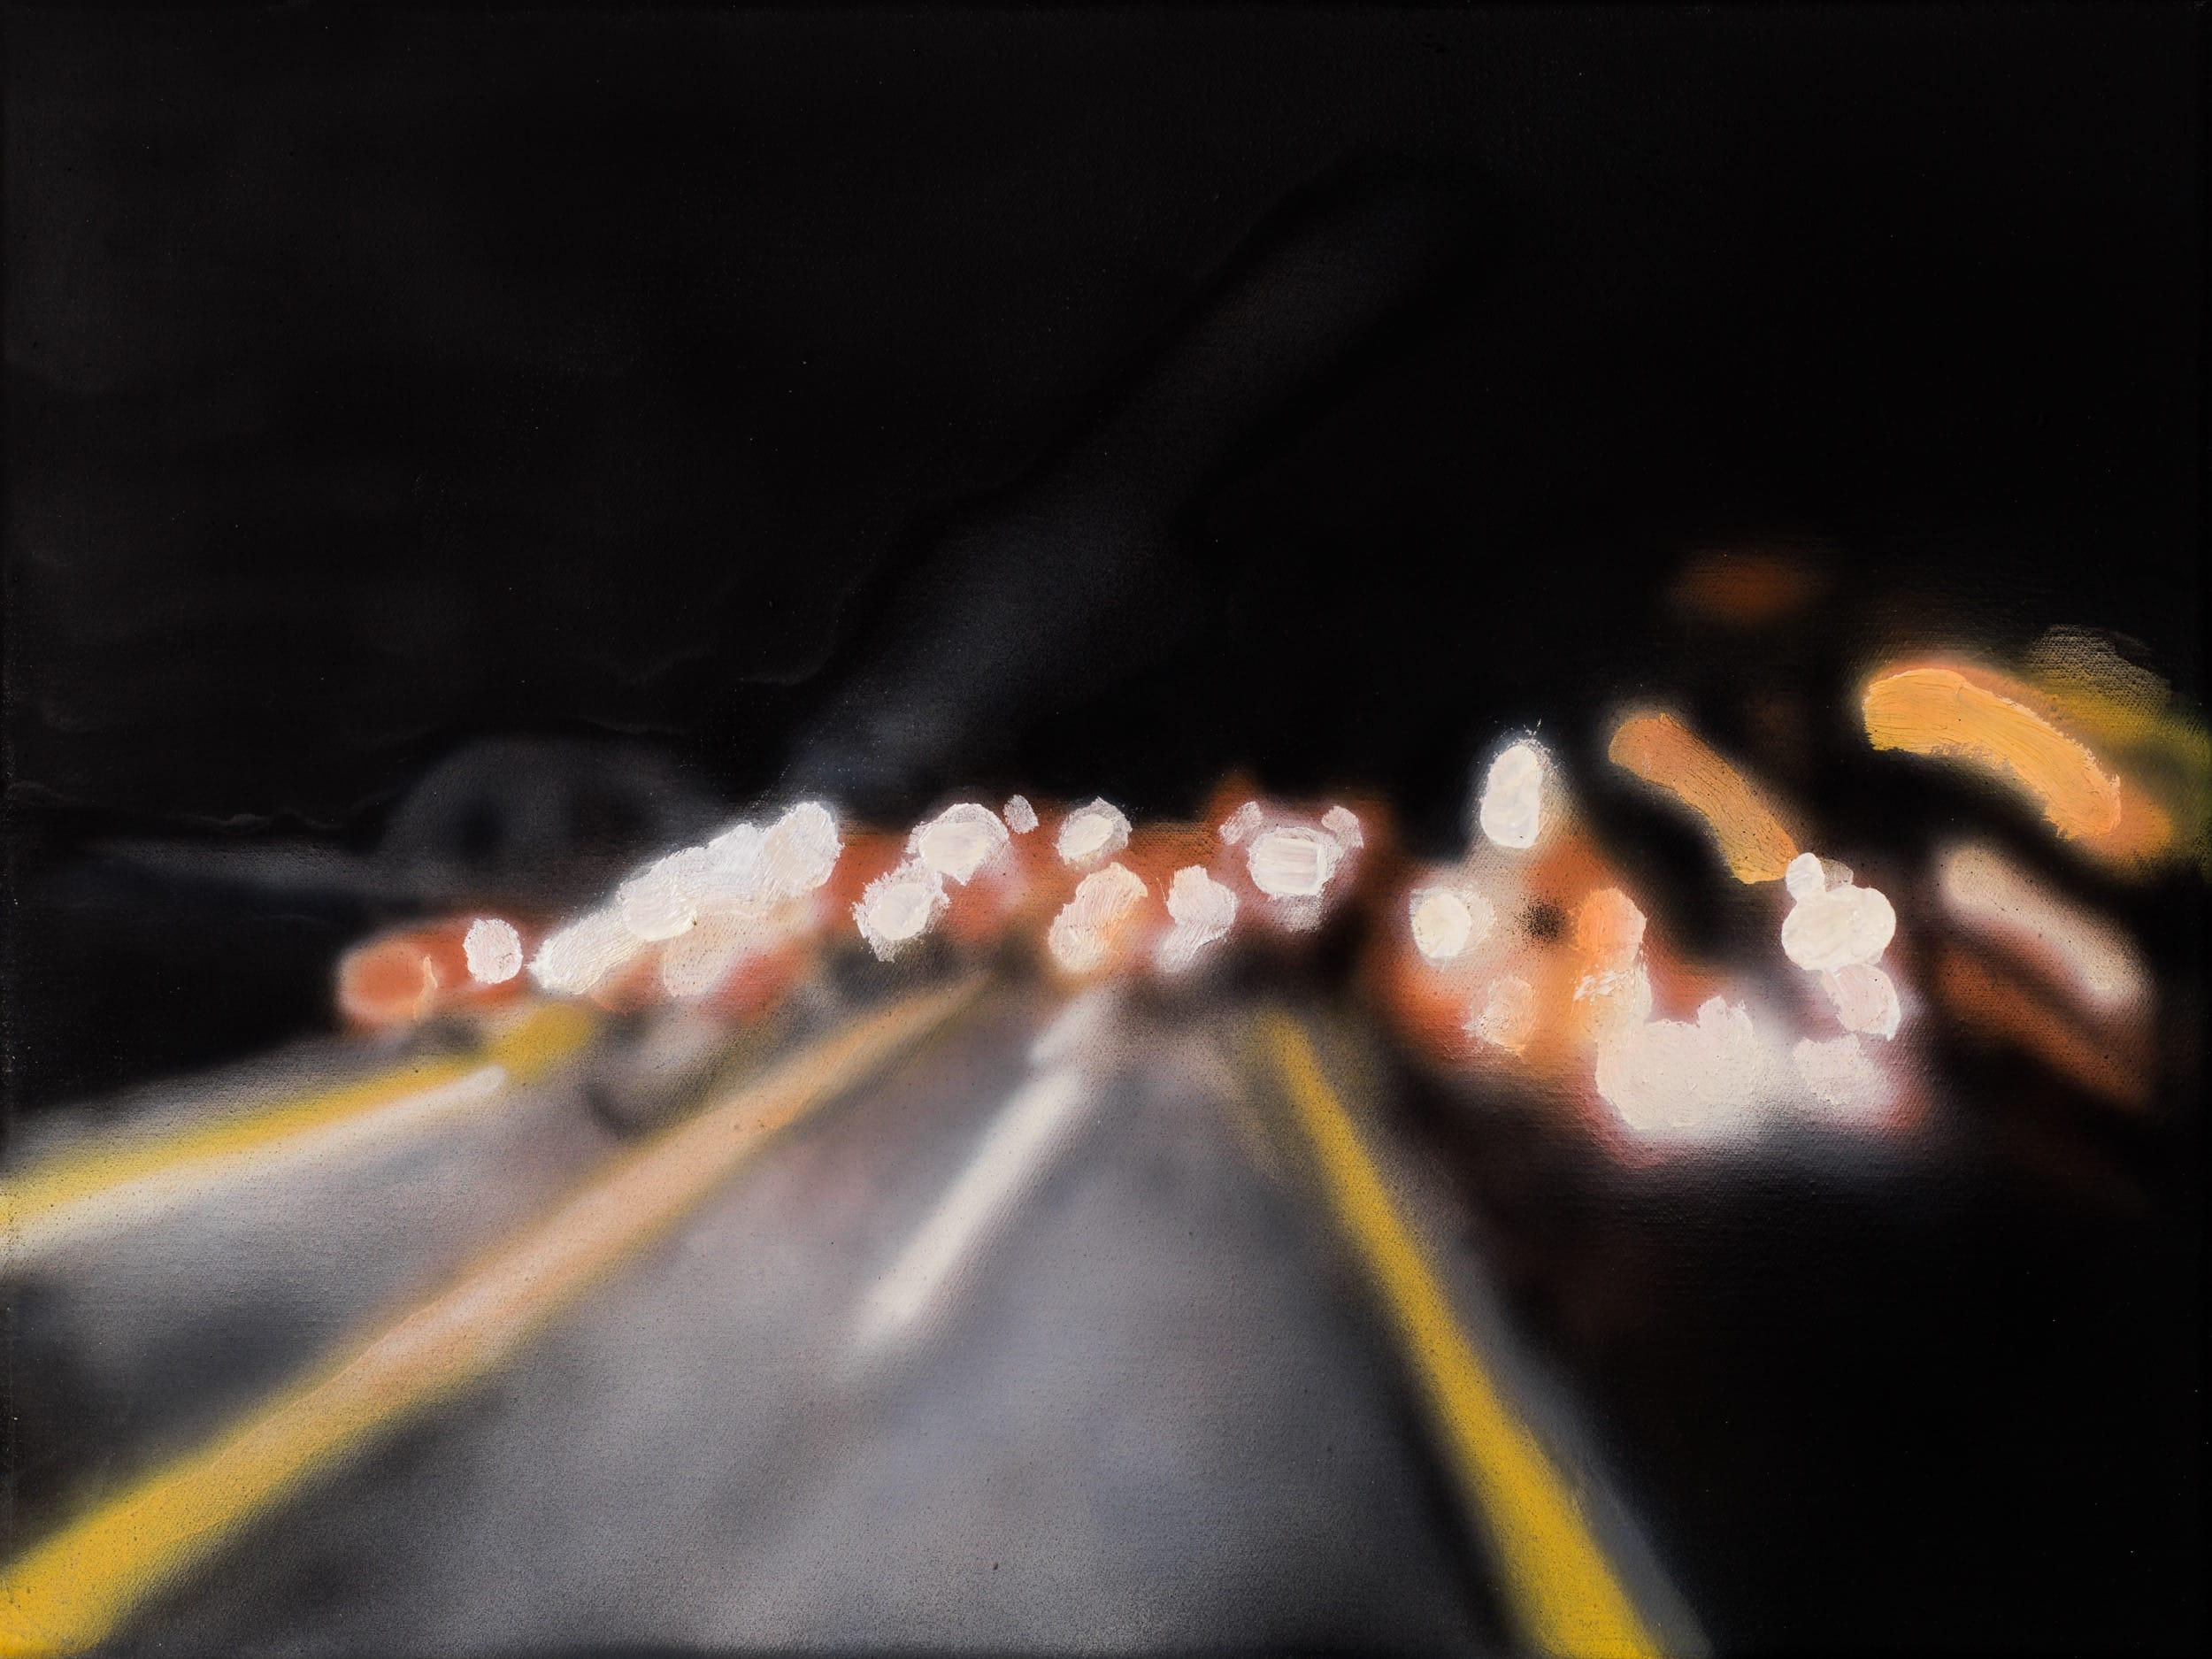 A2, Dortmund. Oil on canvas, 40 x 30 cm, 2019